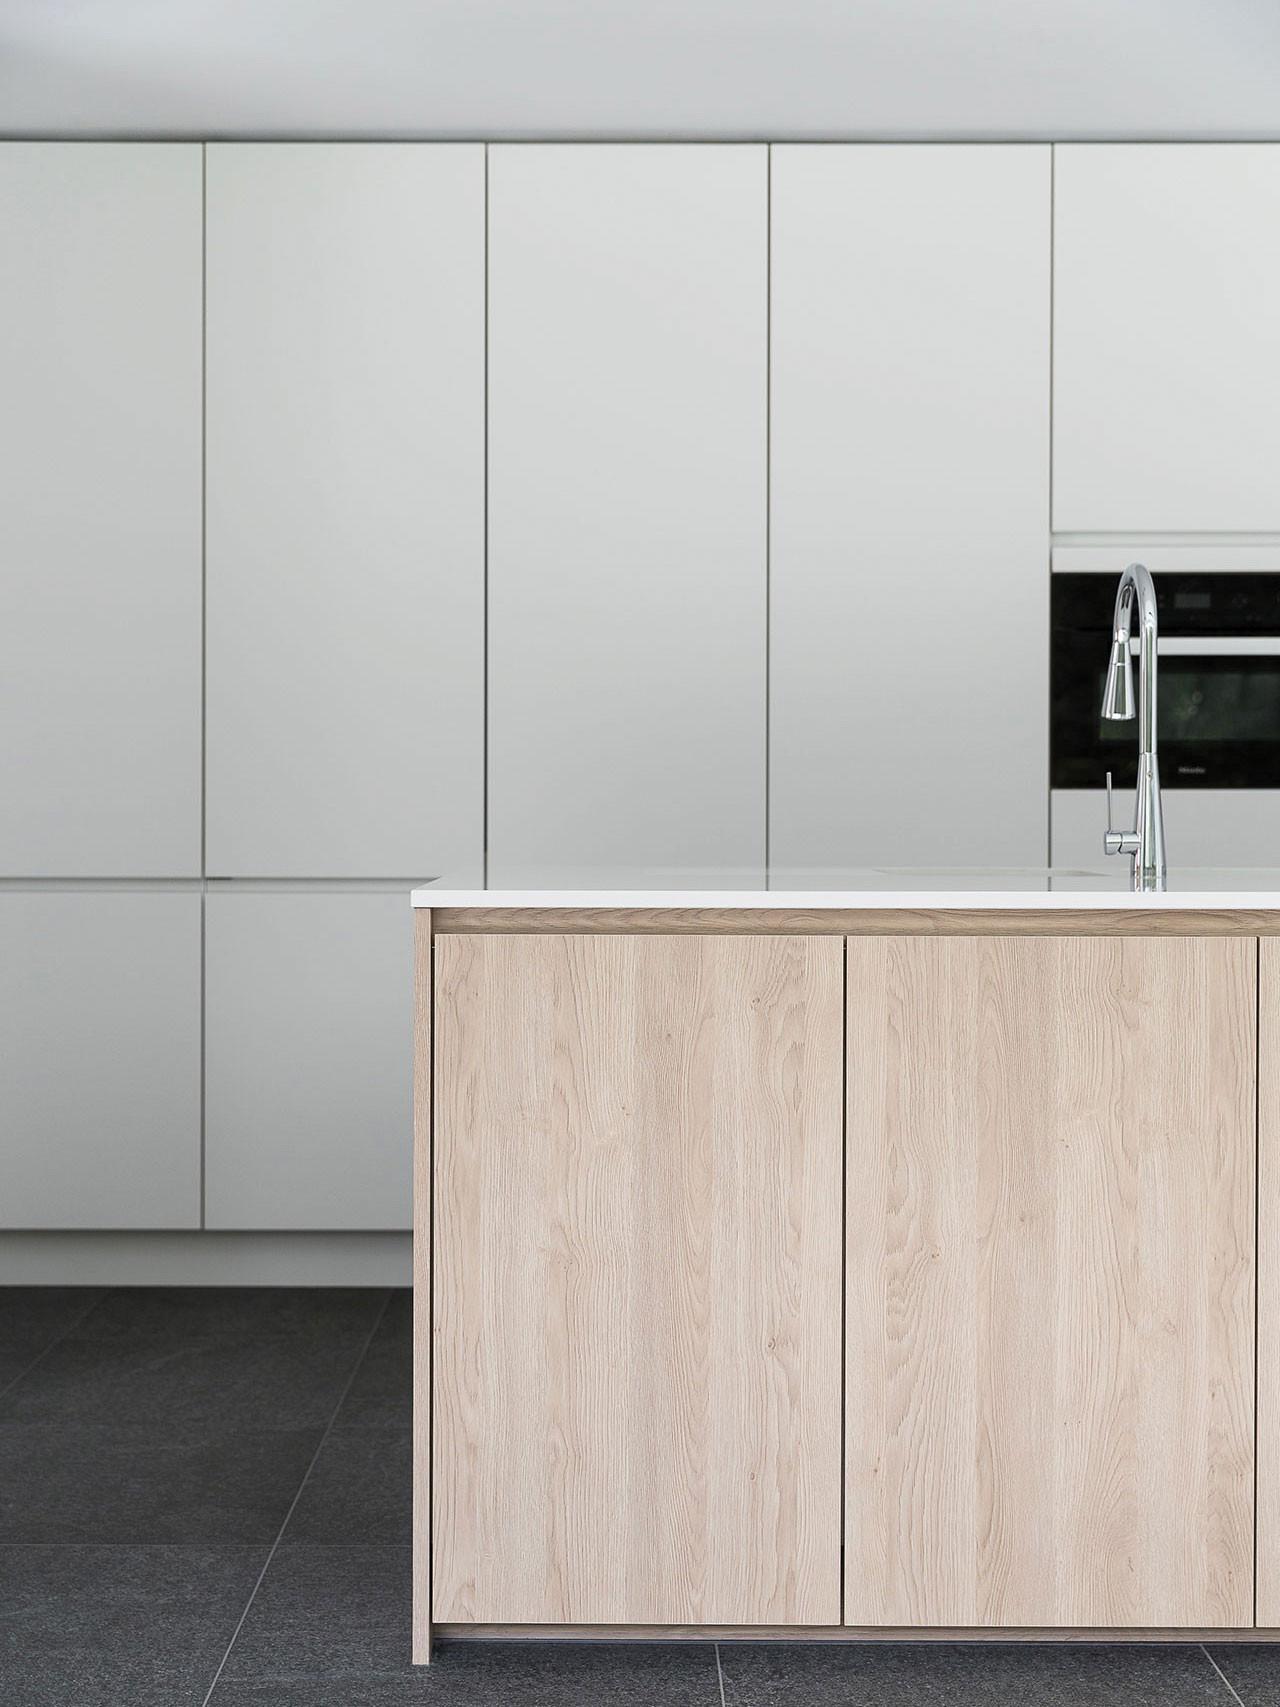 Dekeyzer-hedendaagse-keuken-greeploos-satijnlak-houtdecor-2.jpg